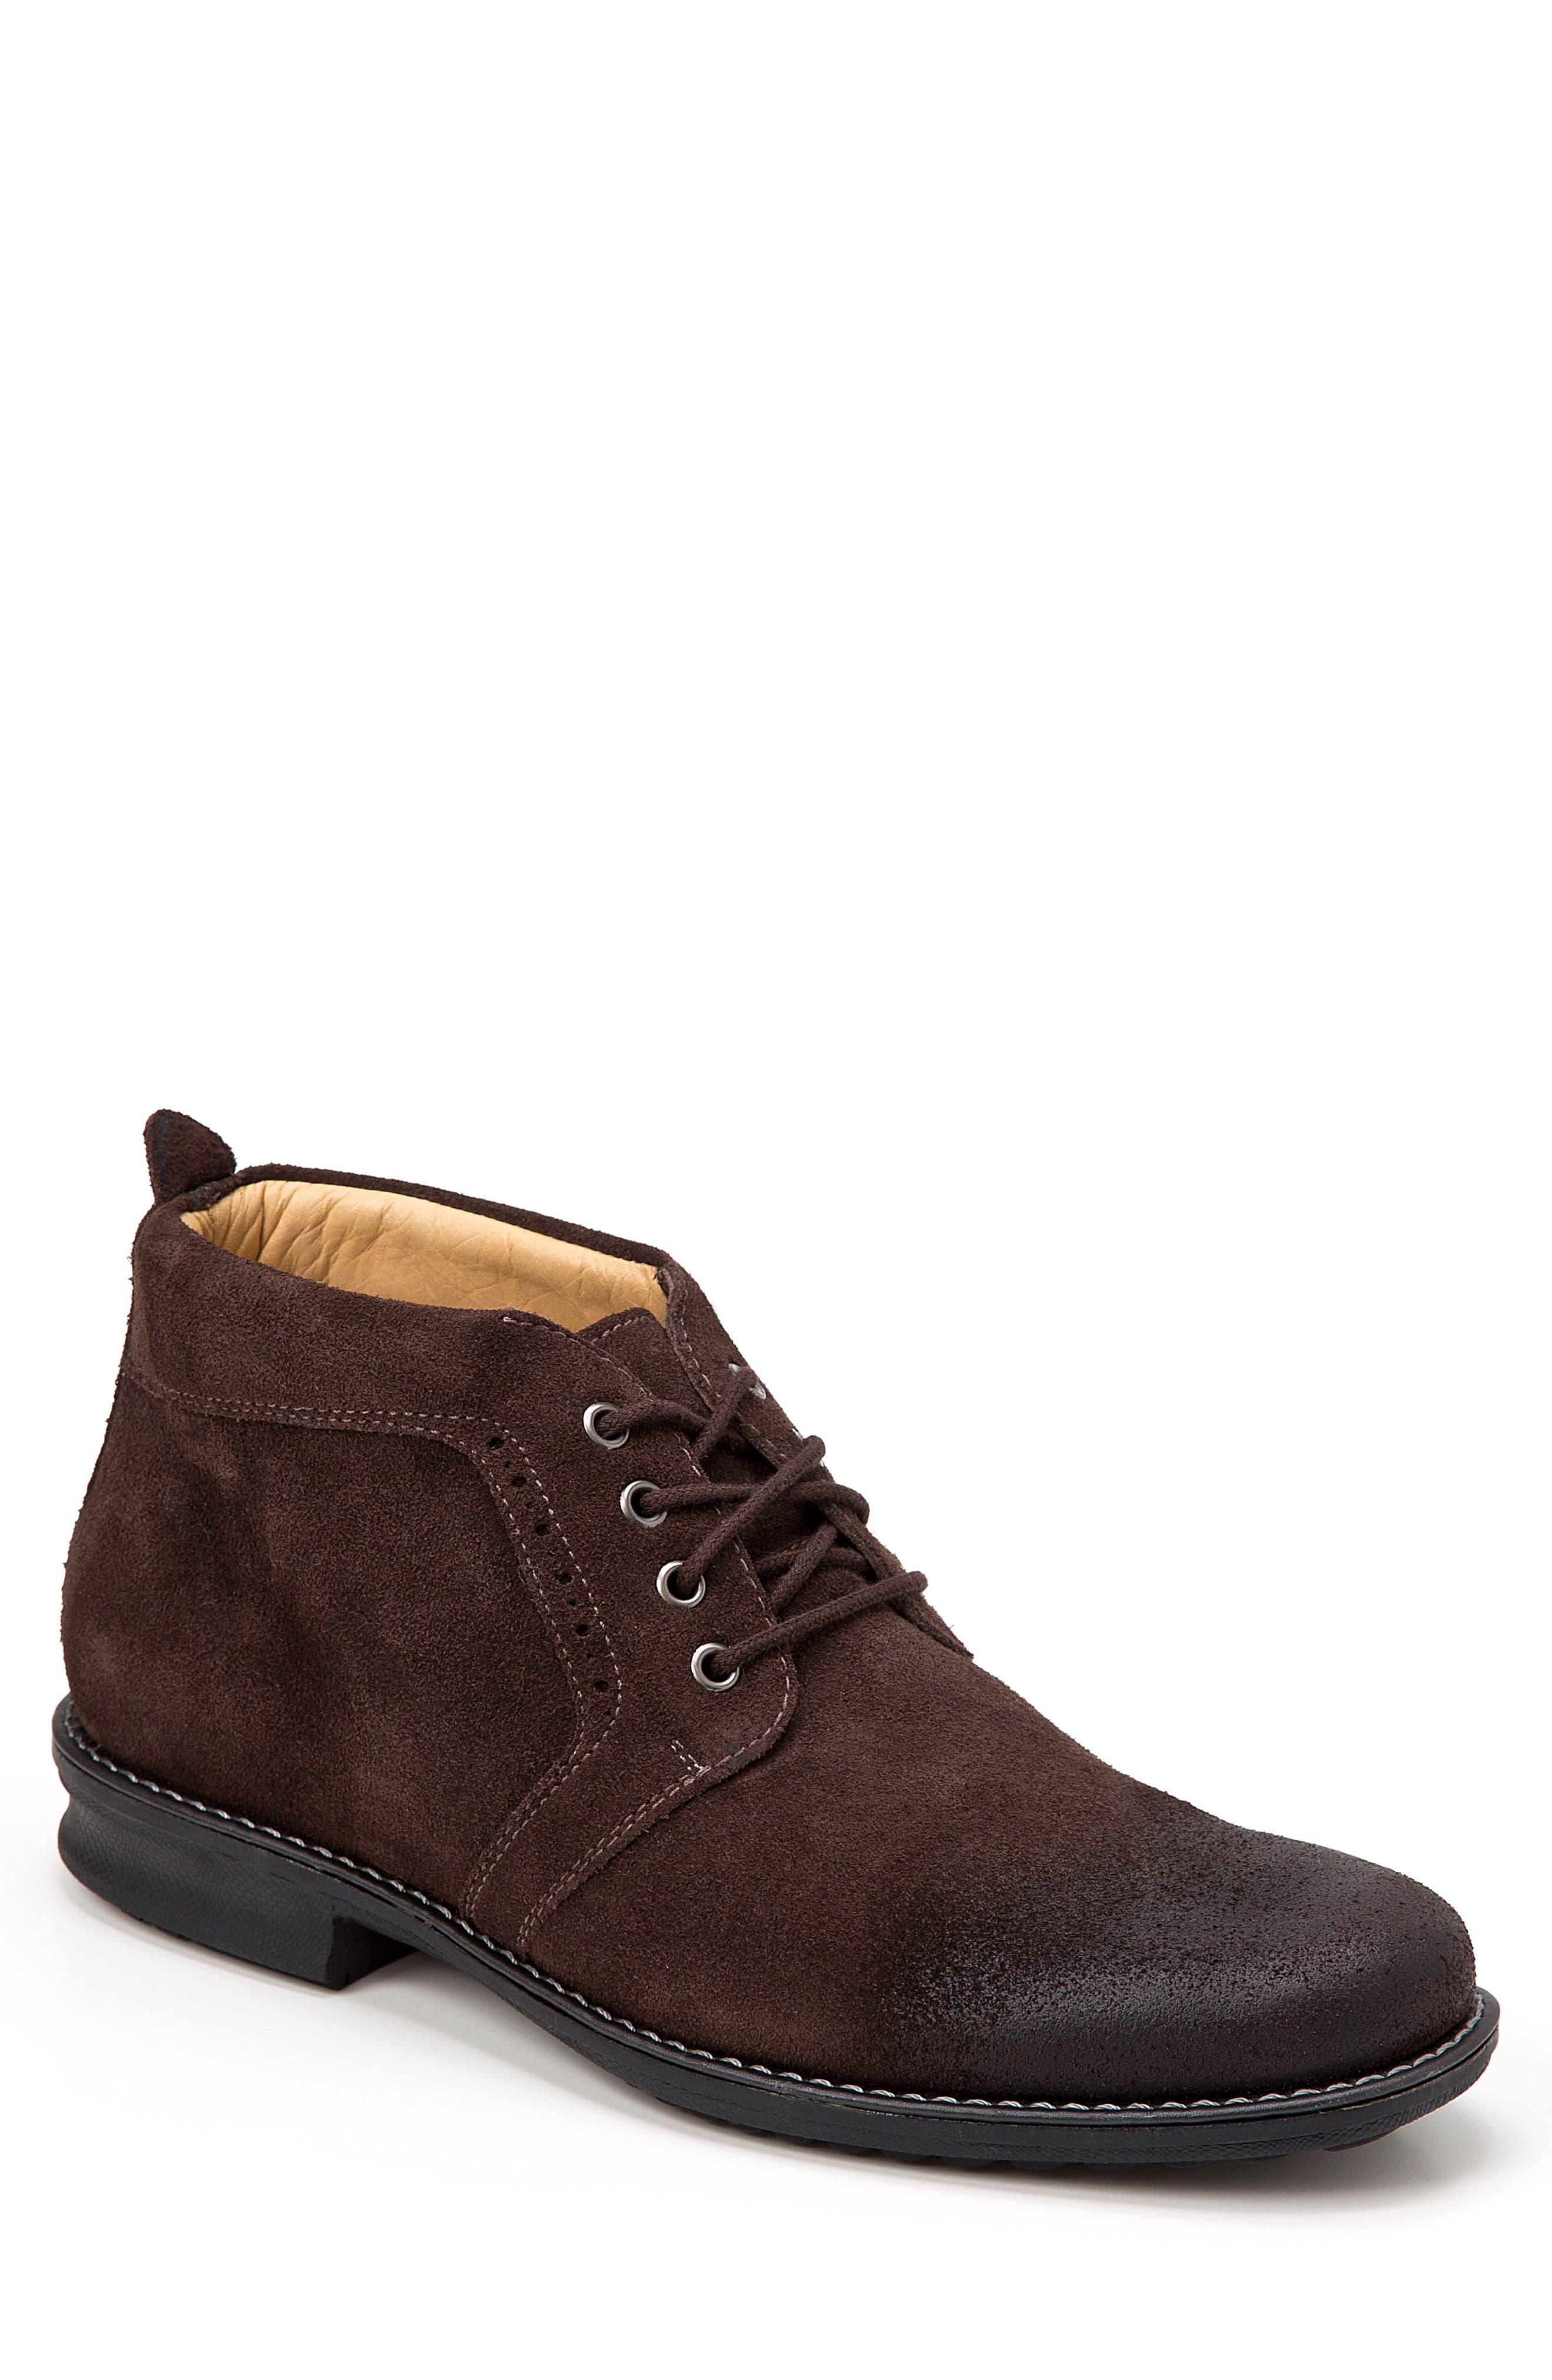 Chukka Boot,                         Main,                         color, Brown